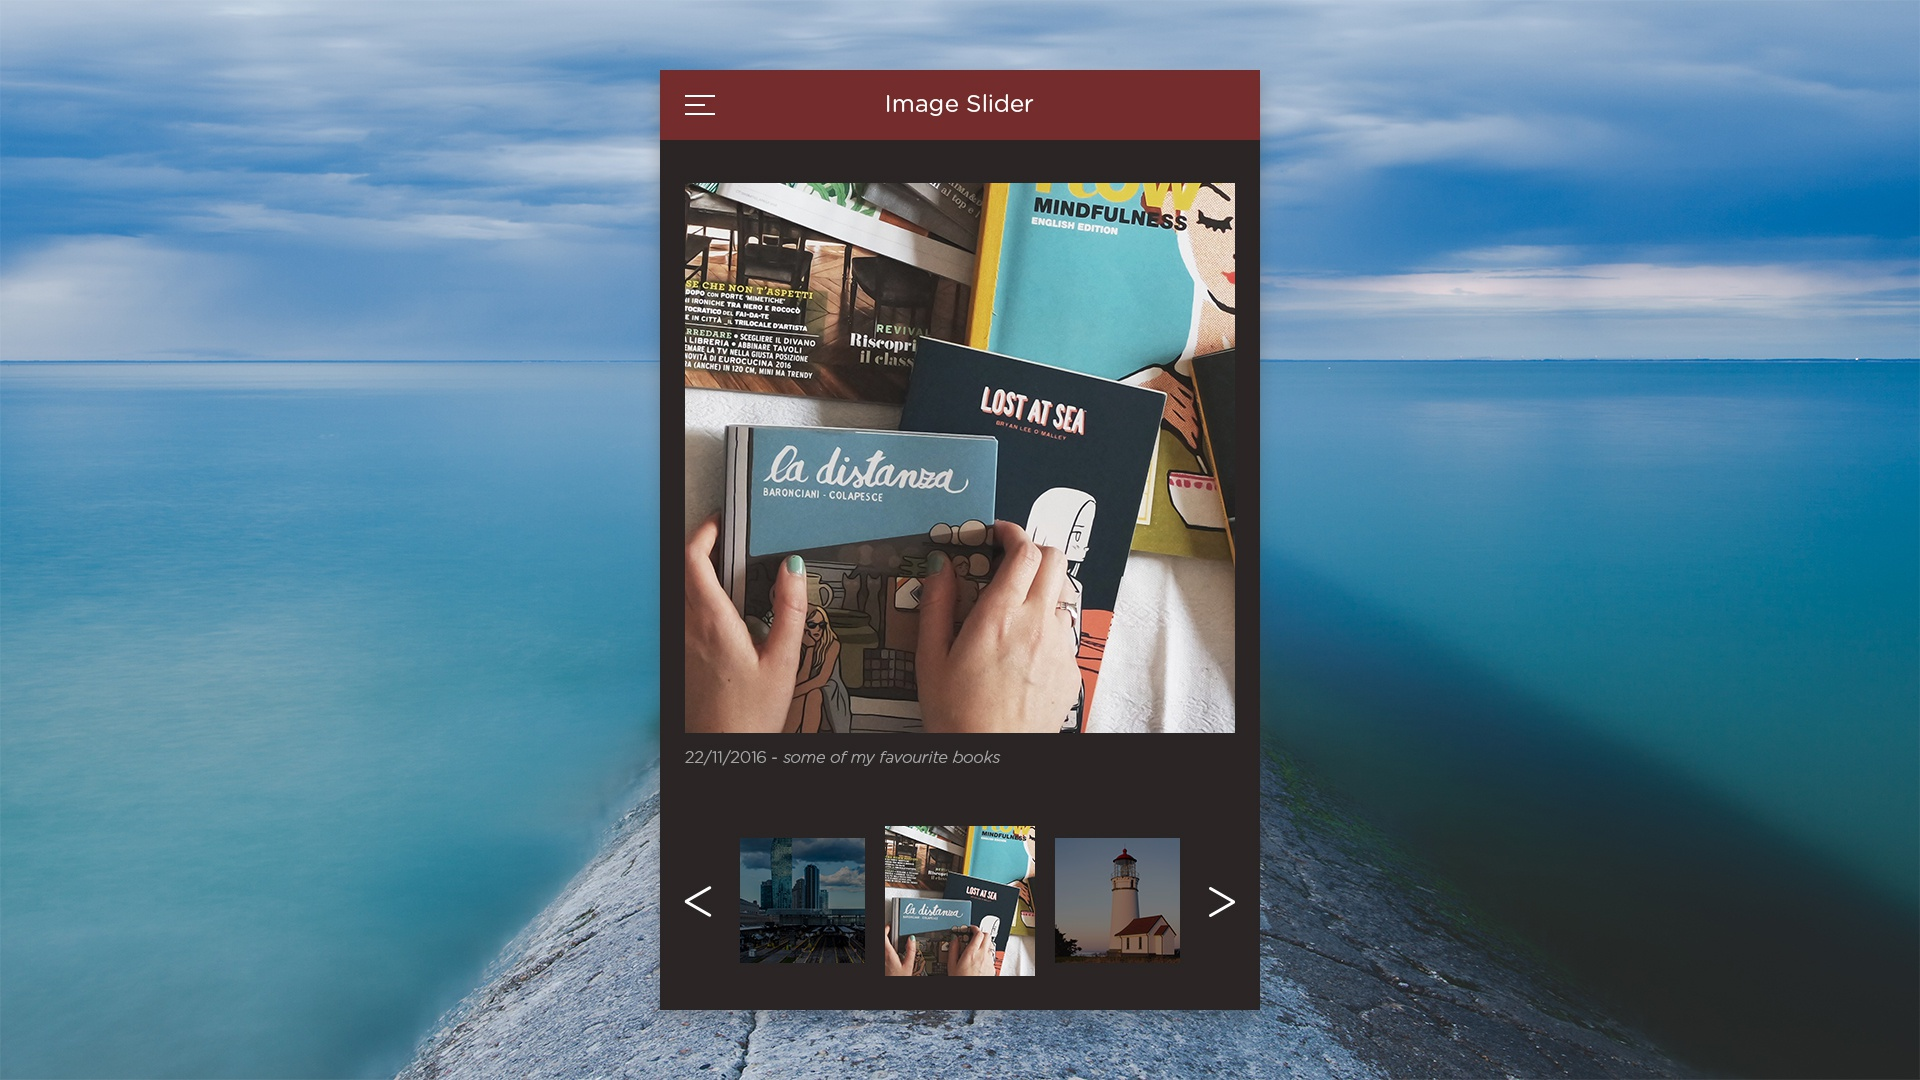 Ui 022 mobile image slider